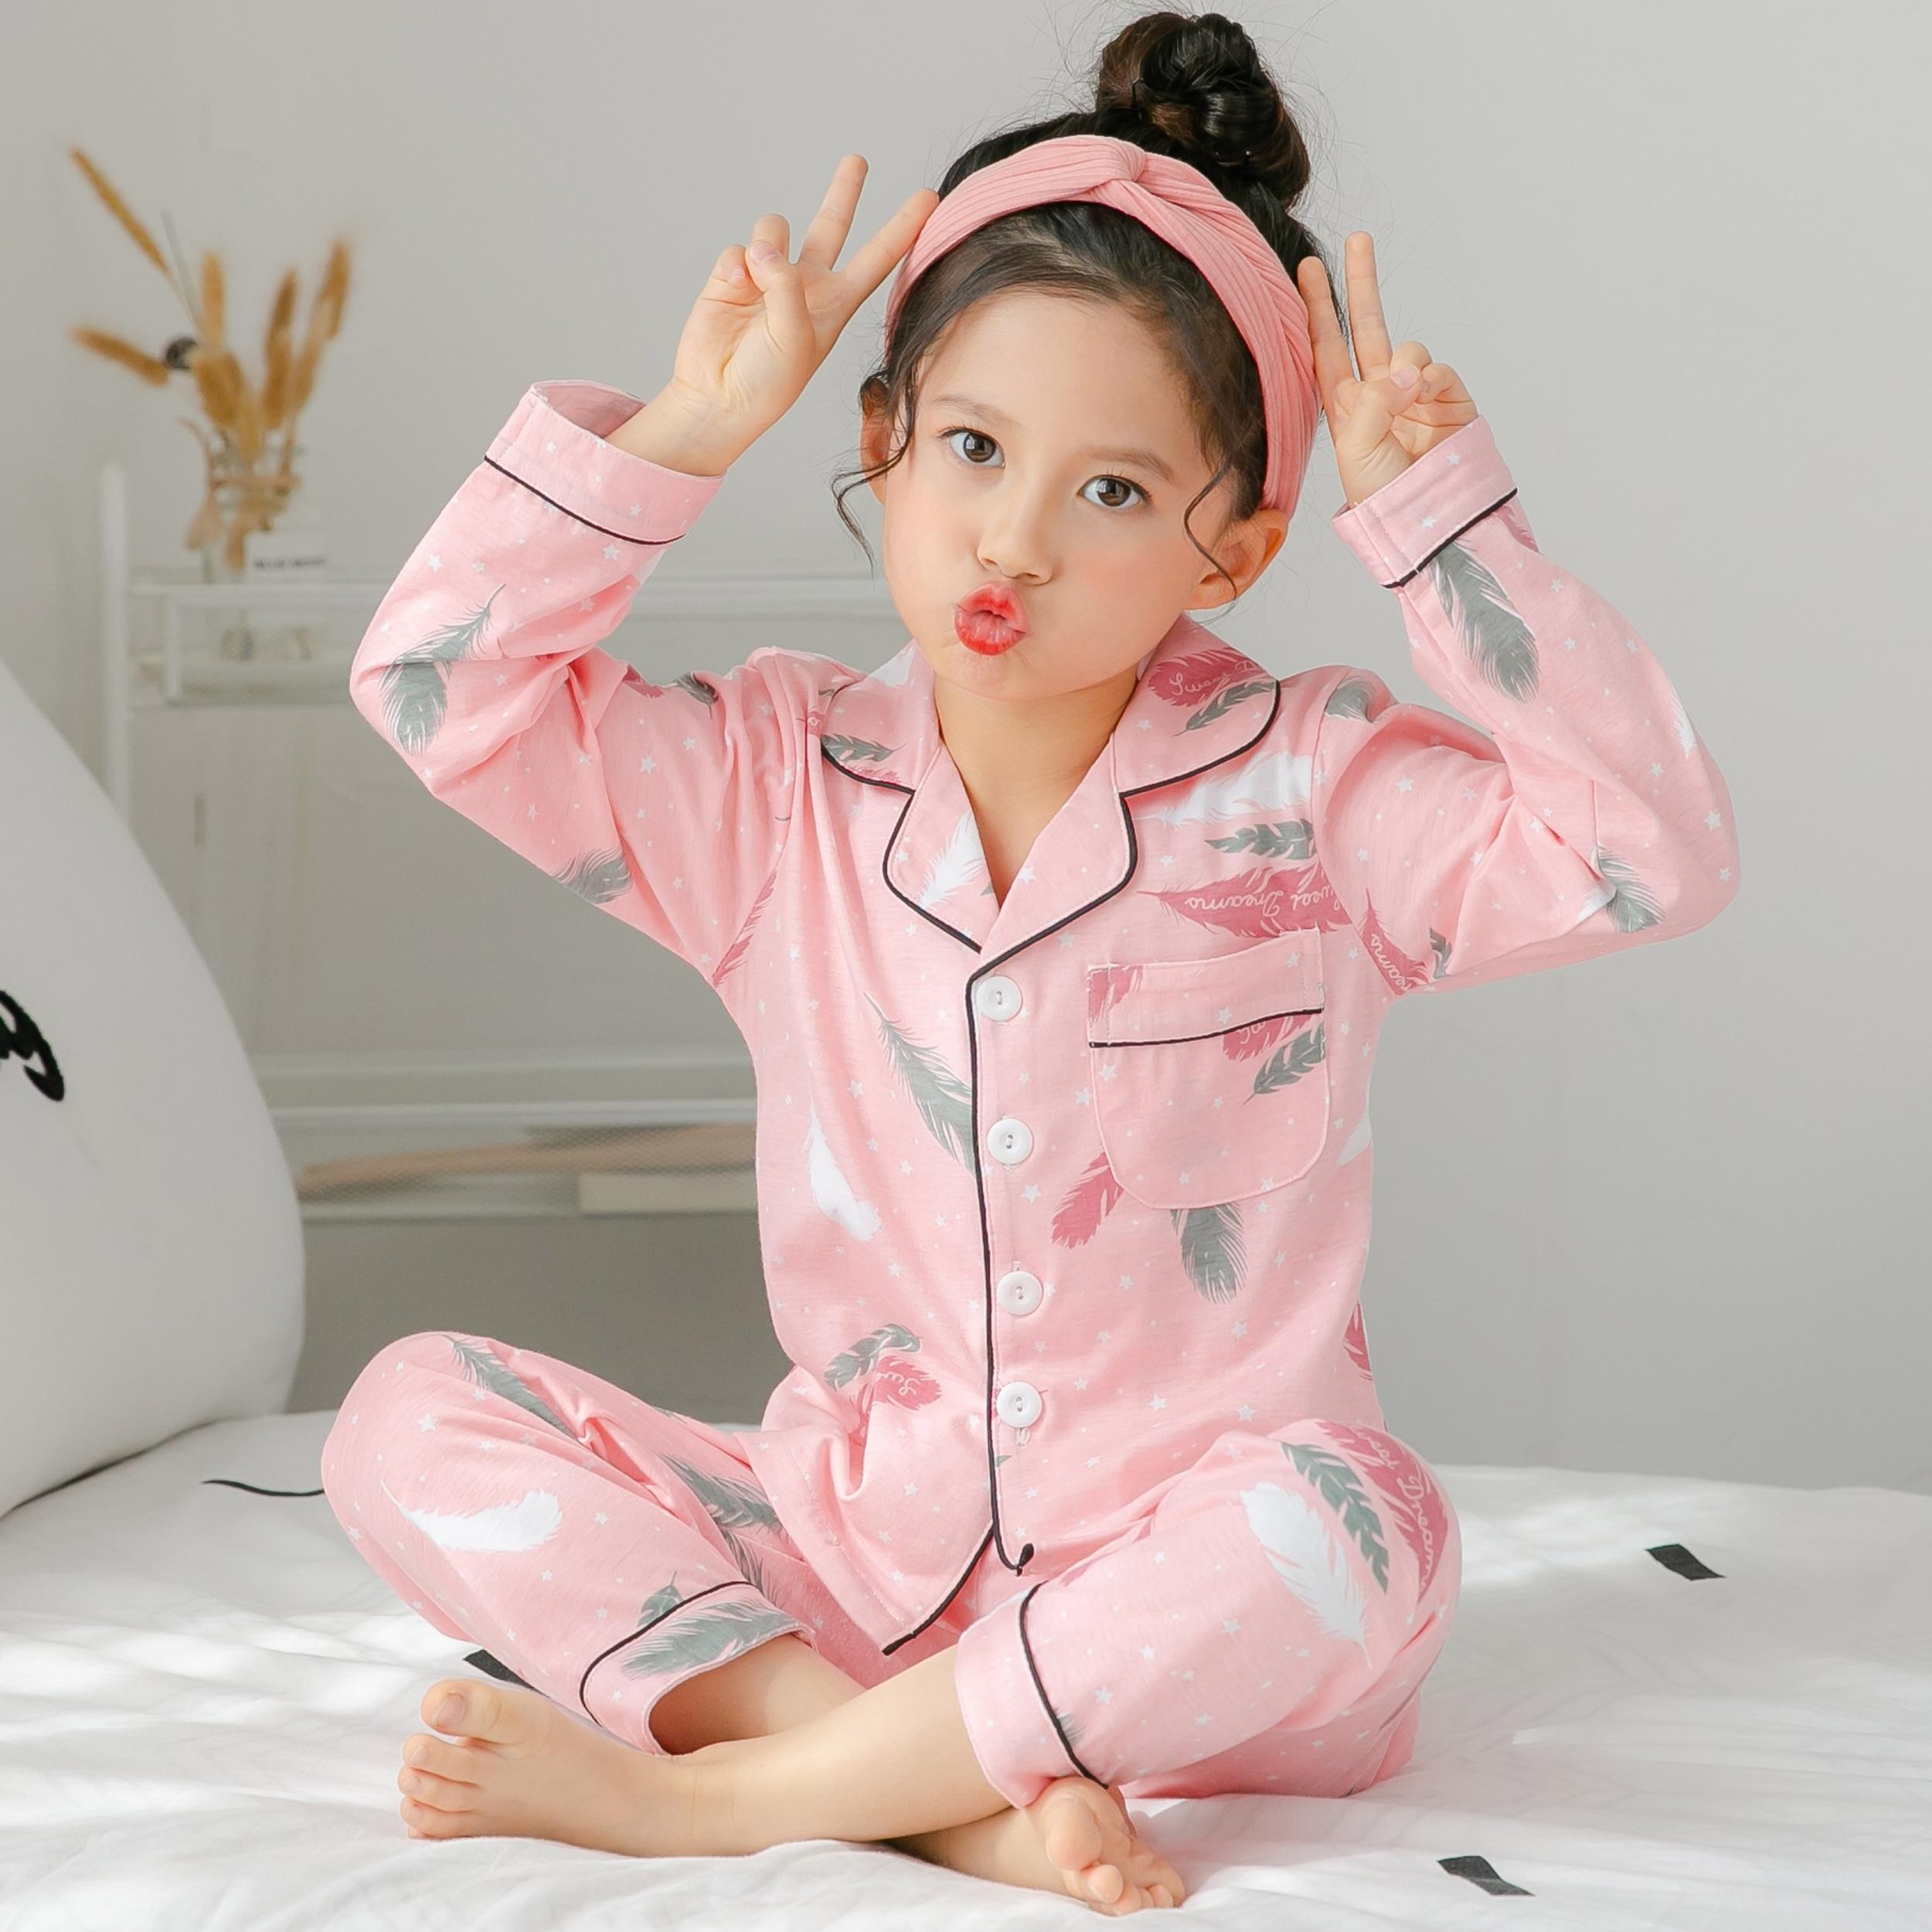 New Maternity Pajamas 2pcs Sets Sleepwear for Pregnant